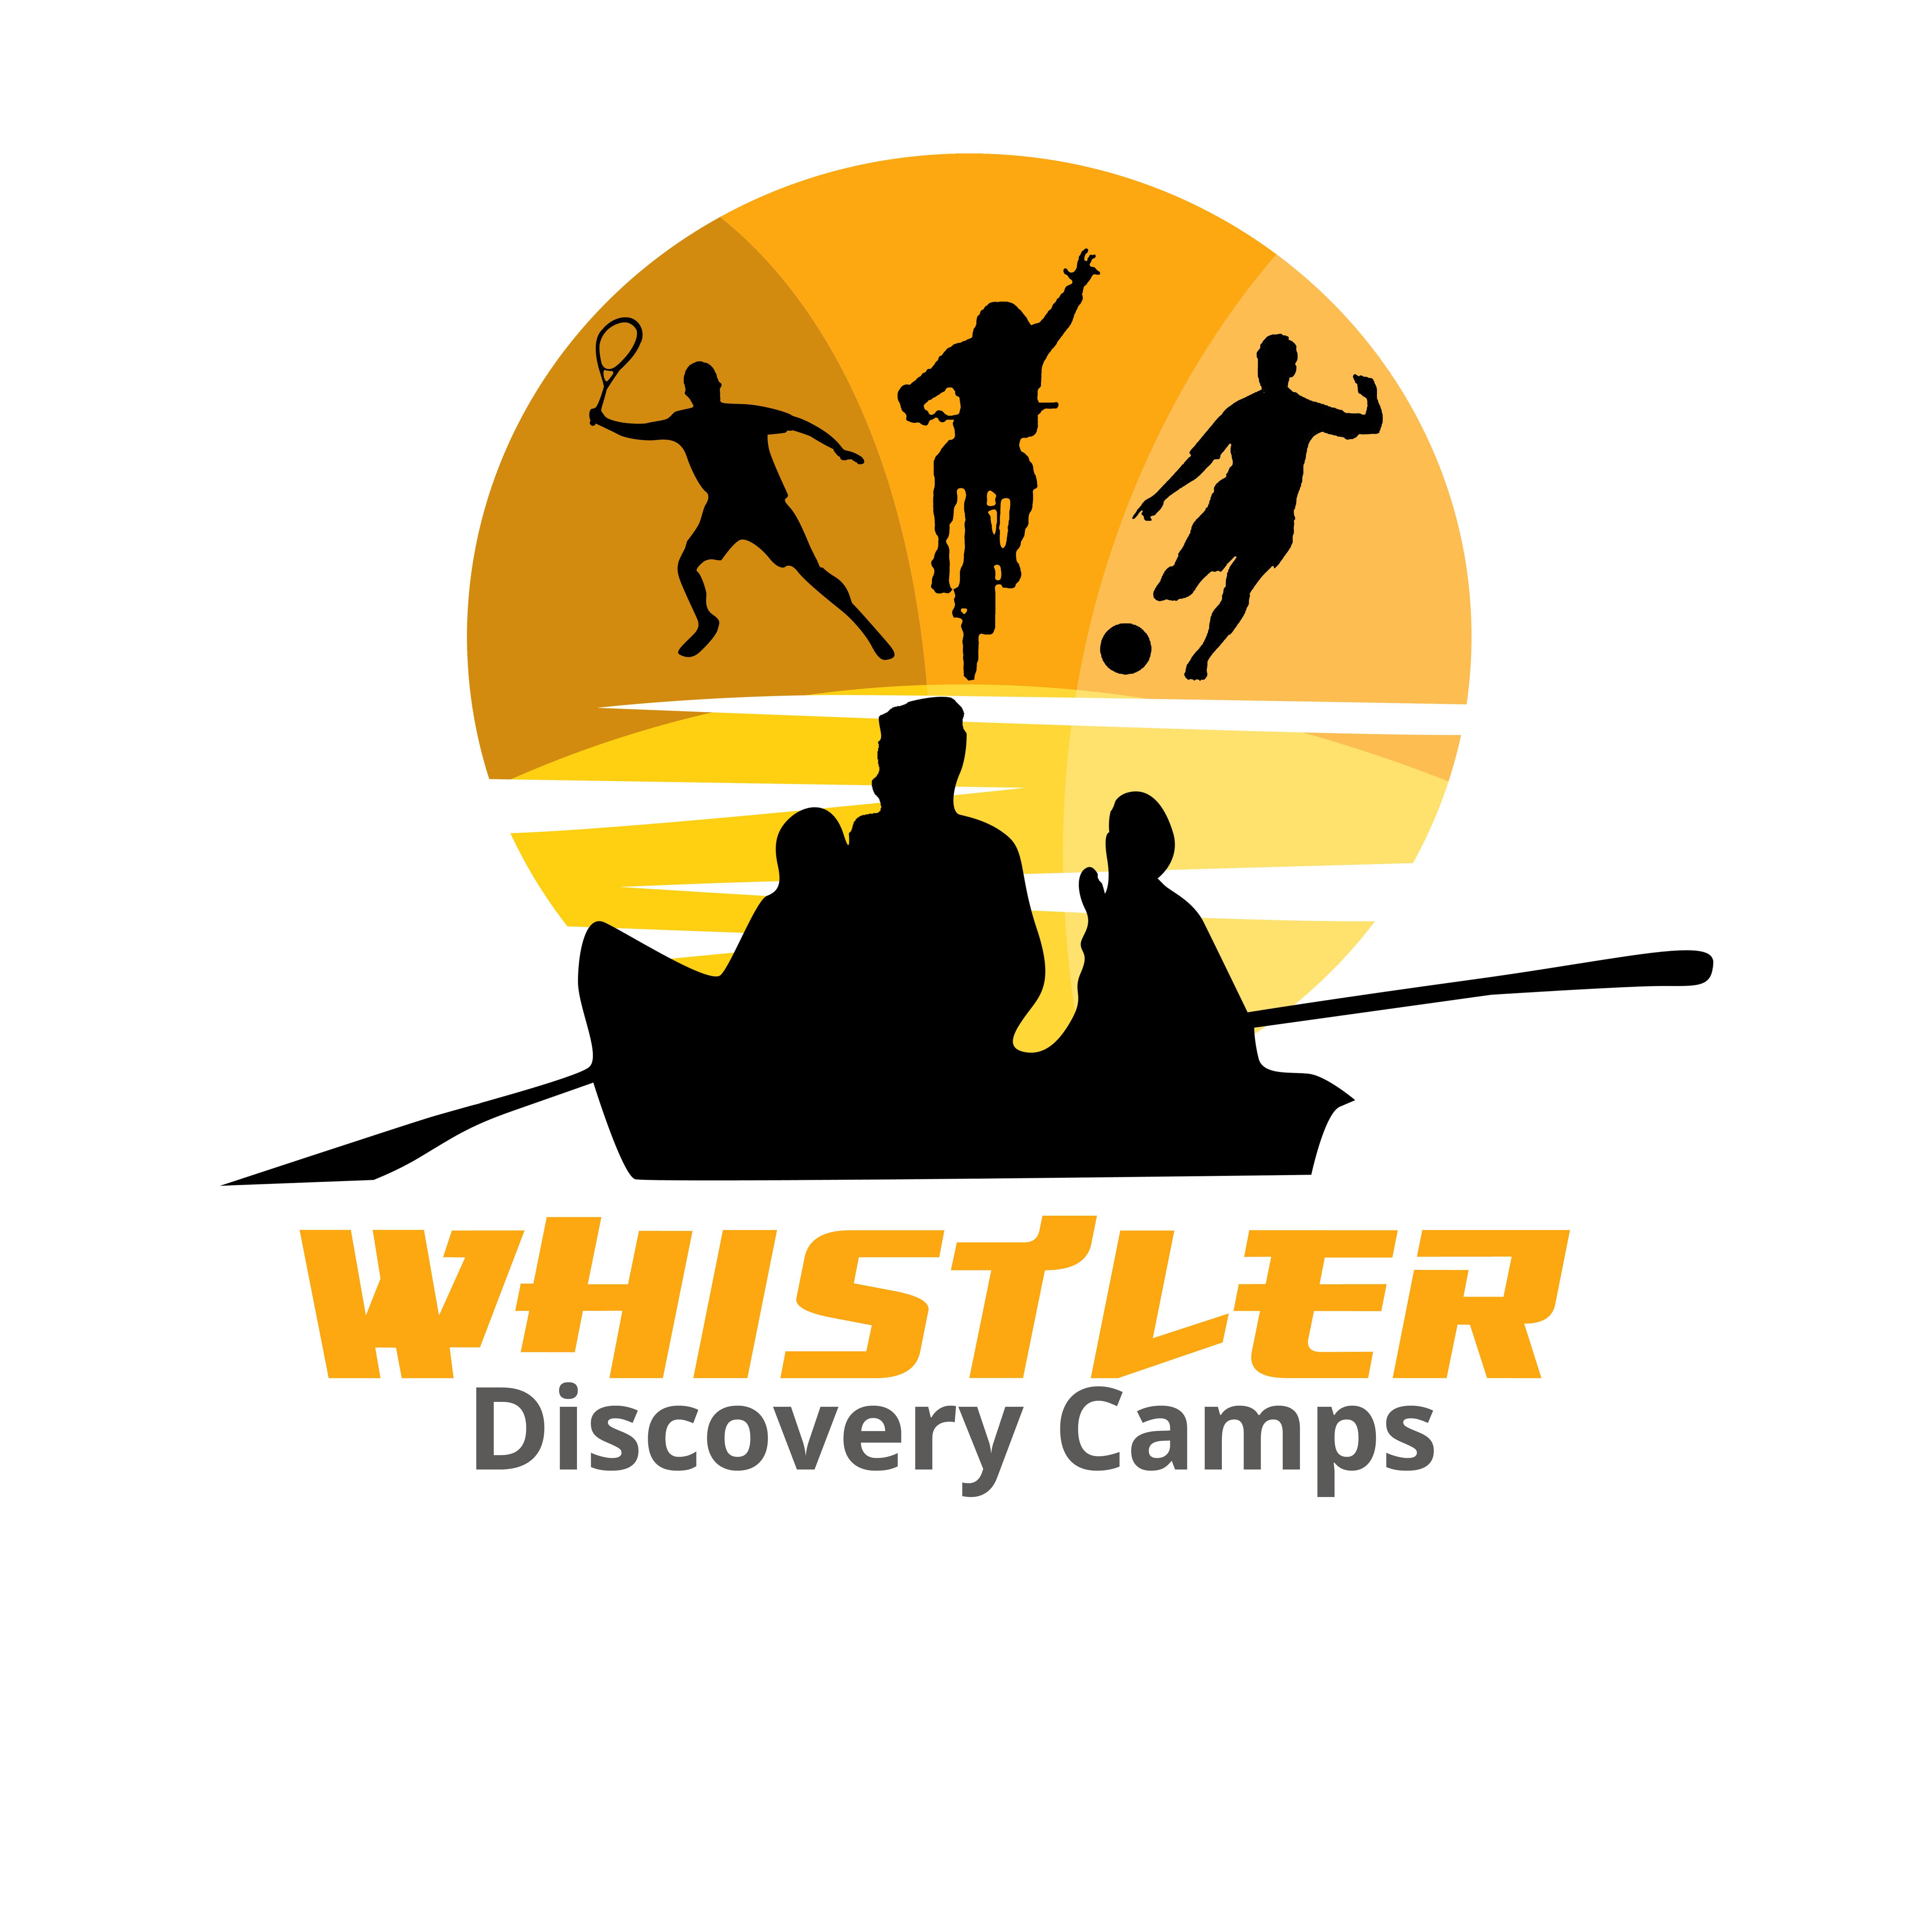 Logo Design by Allan Esclamado - Entry No. 88 in the Logo Design Contest Captivating Logo Design for Whistler Discovery Camps.